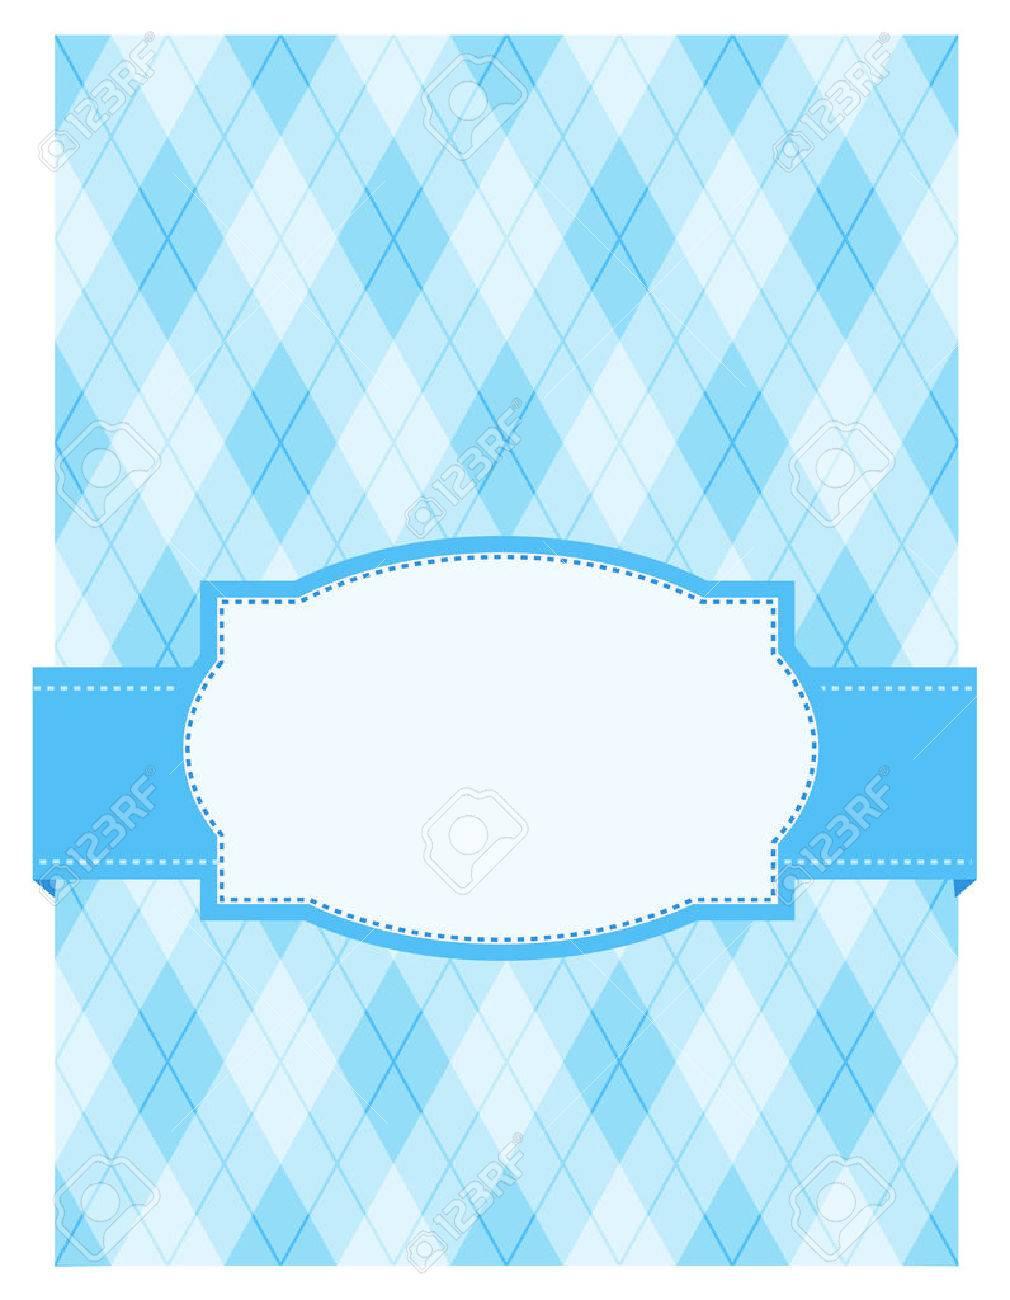 Argyle Azul / Fondo Arlequín Con El Marco. Especialmente Para ...